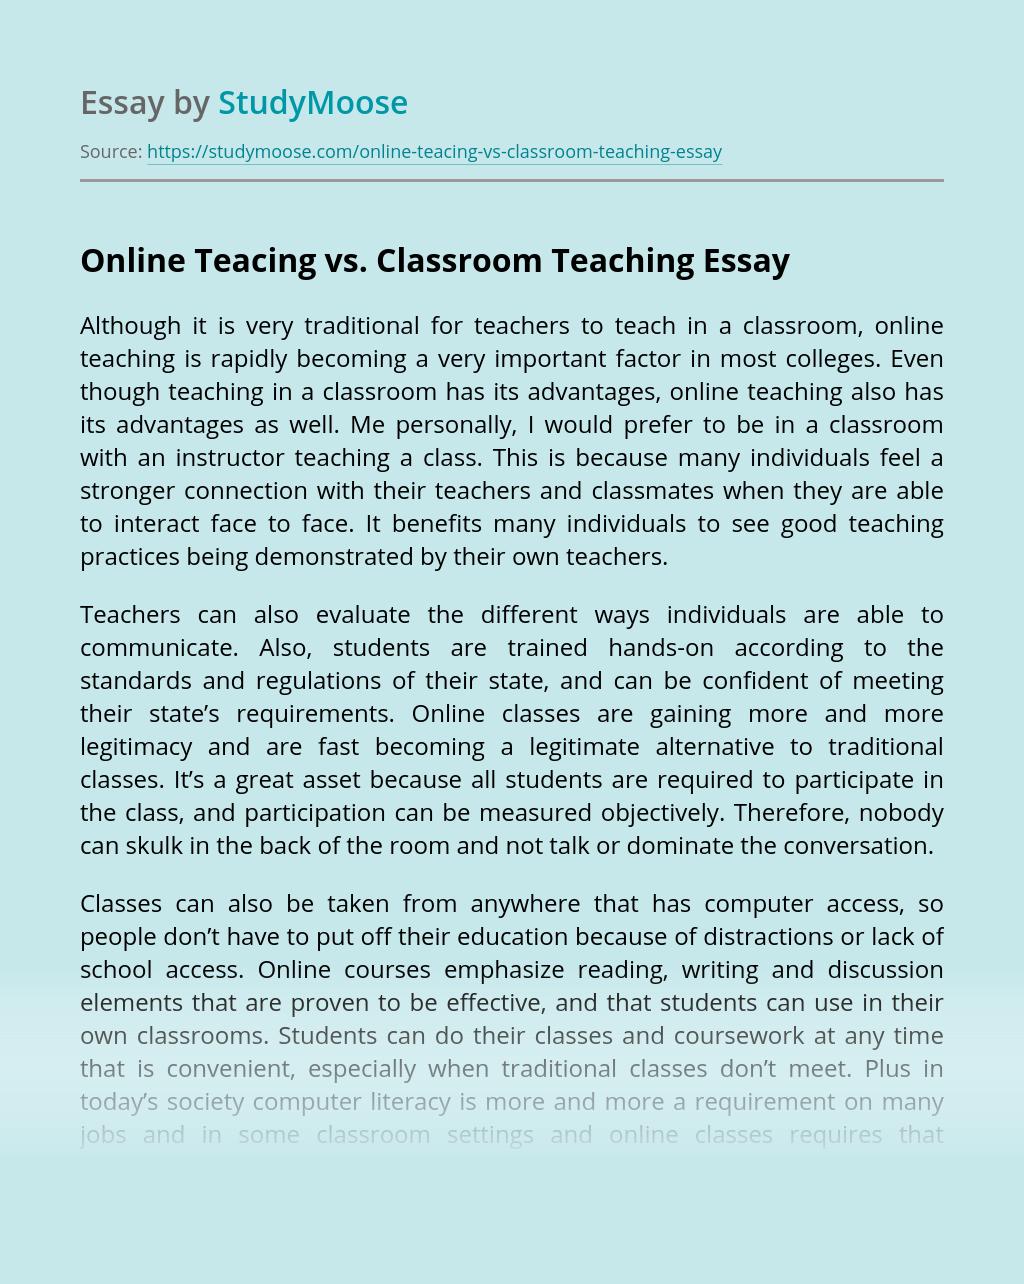 Online Teacing vs. Classroom Teaching